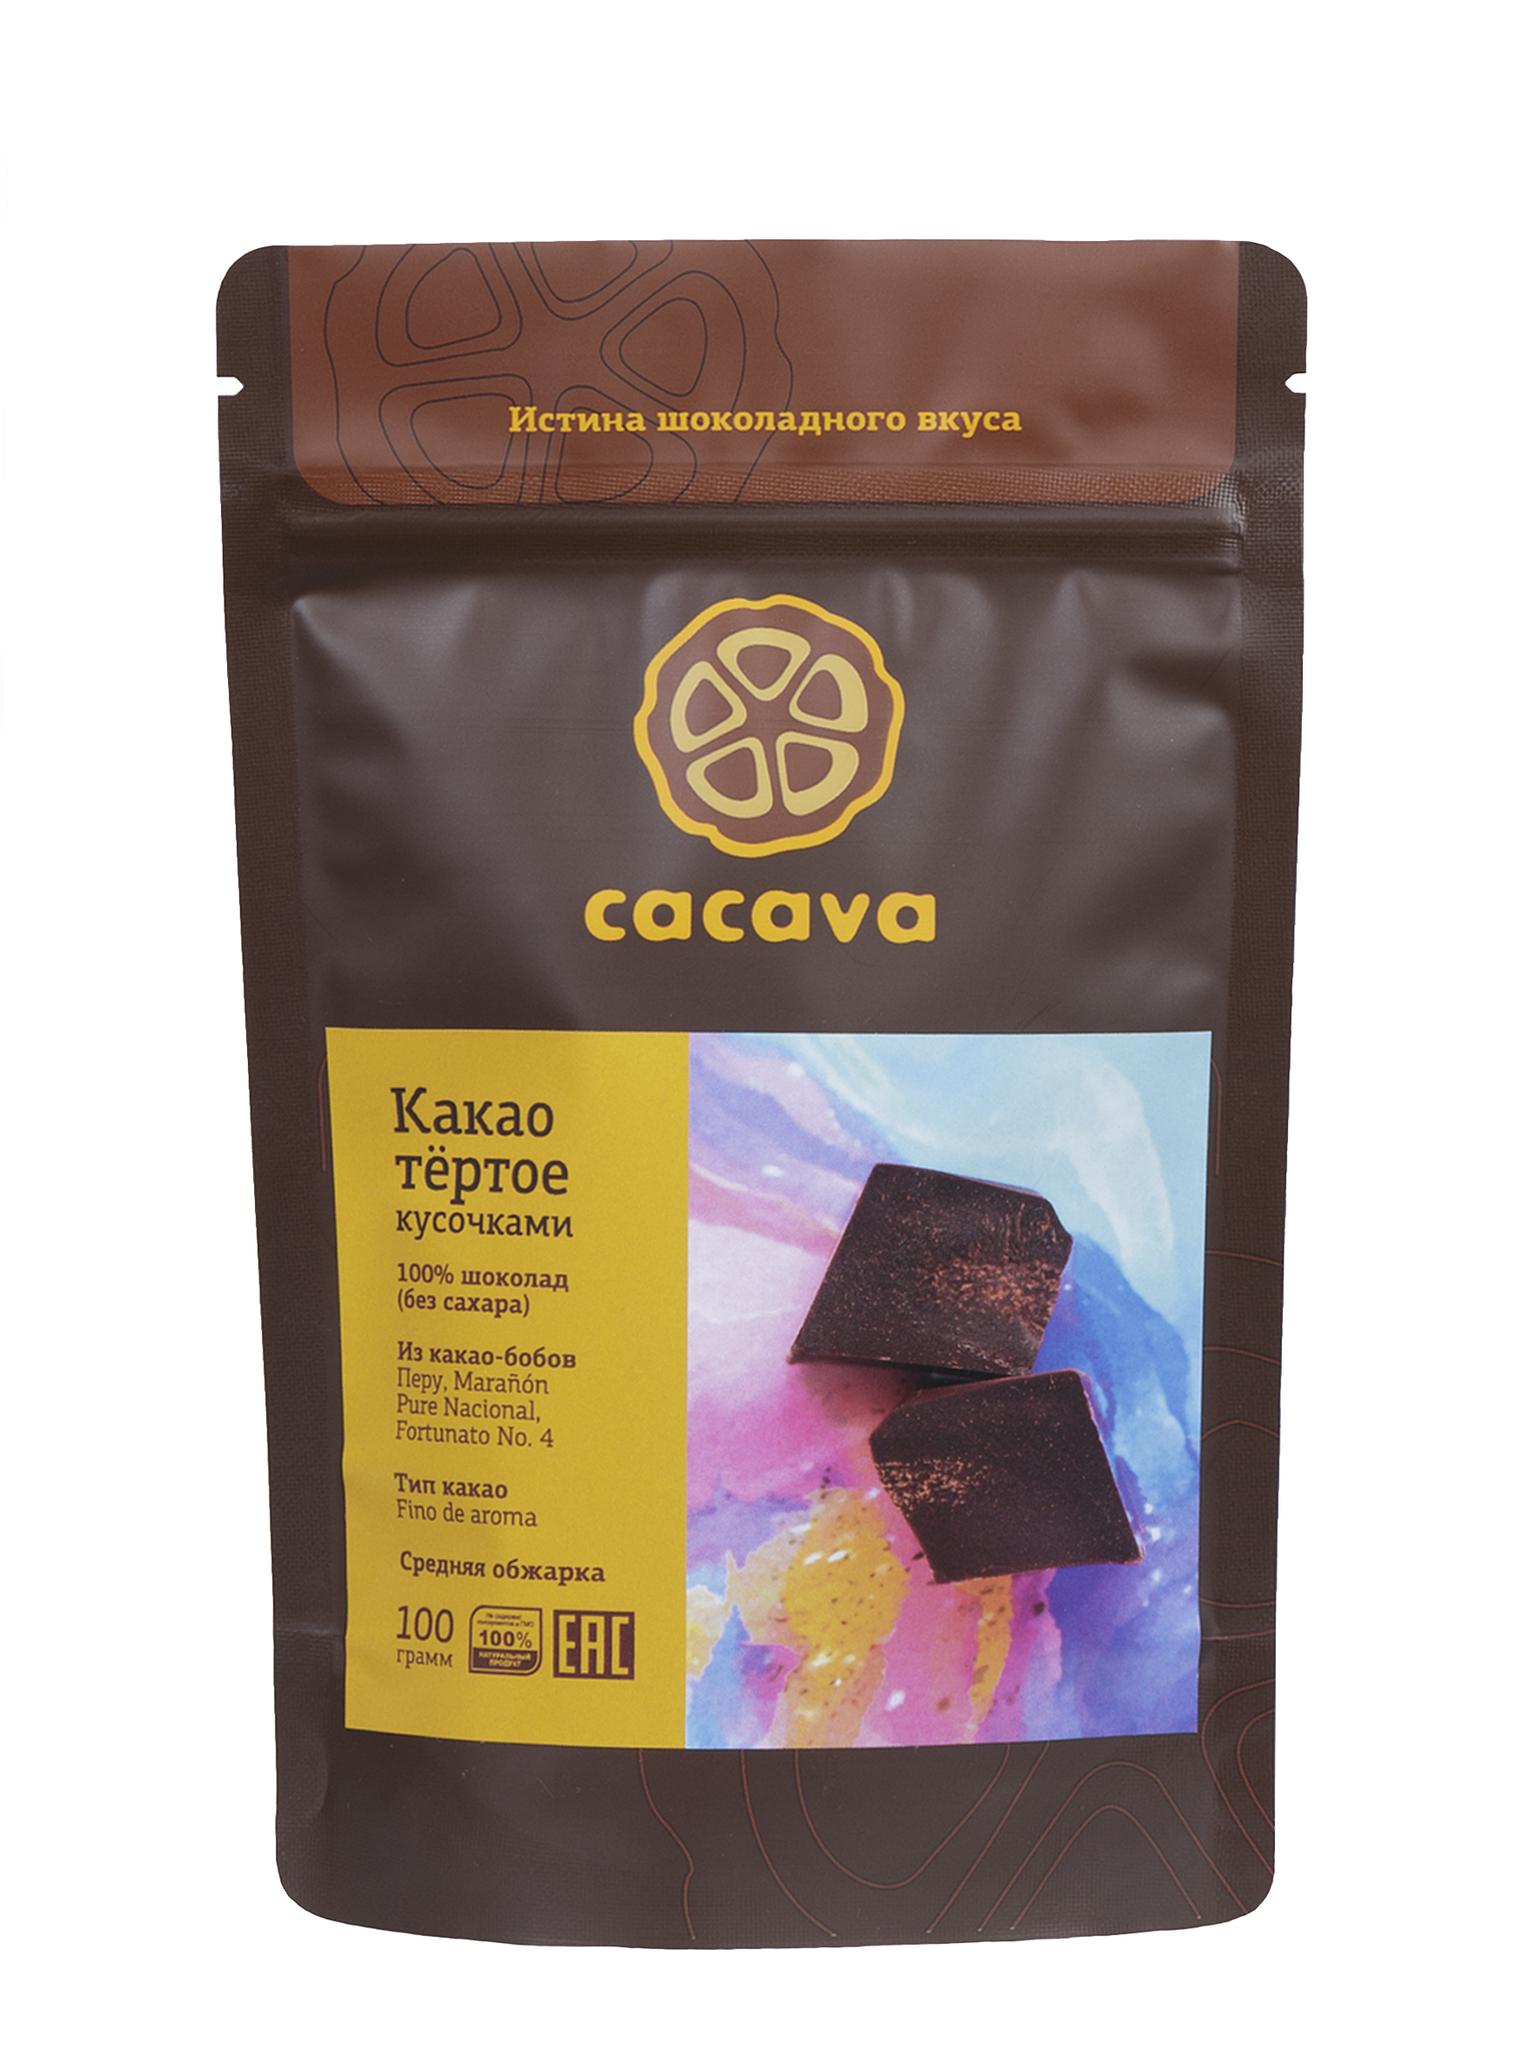 Какао тёртое кусочками (Перу, Marañón), упаковка 100 грамм